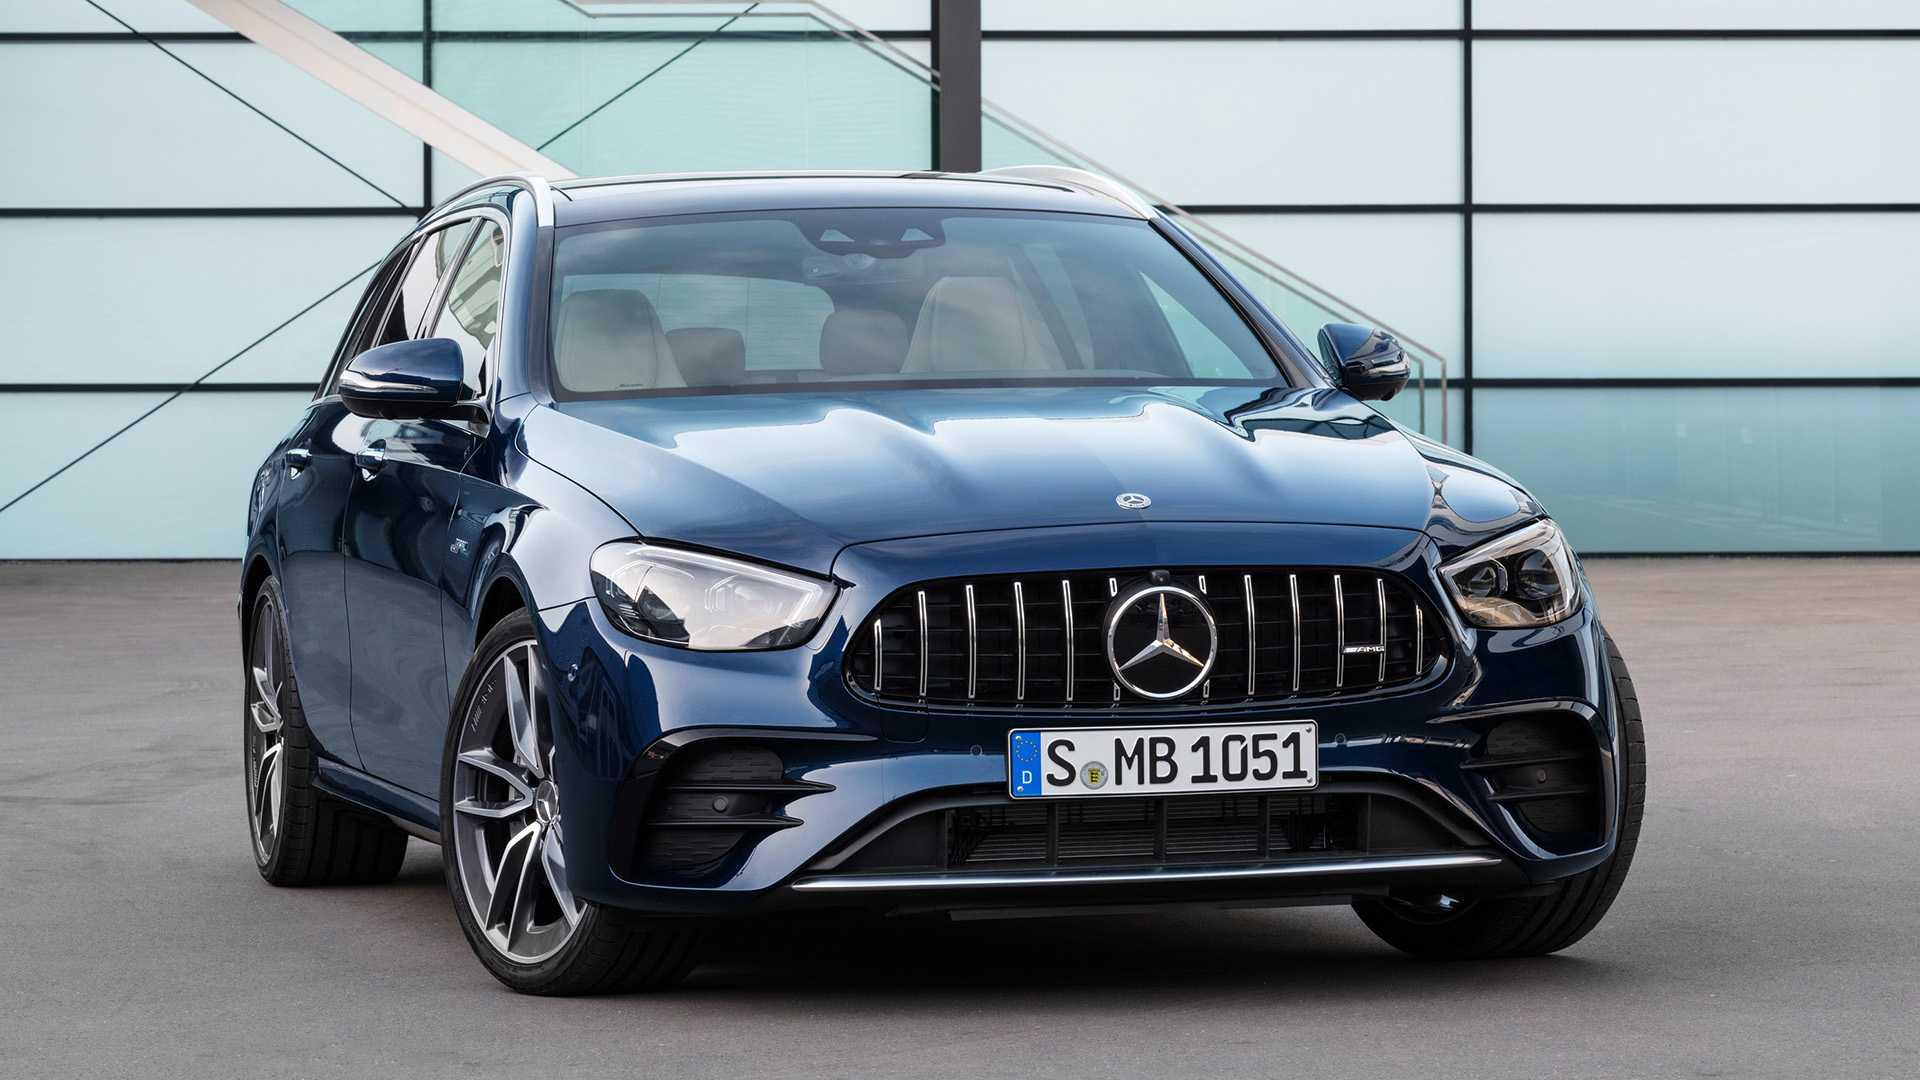 Mercedes-Benz E-класса полностью обновился 3